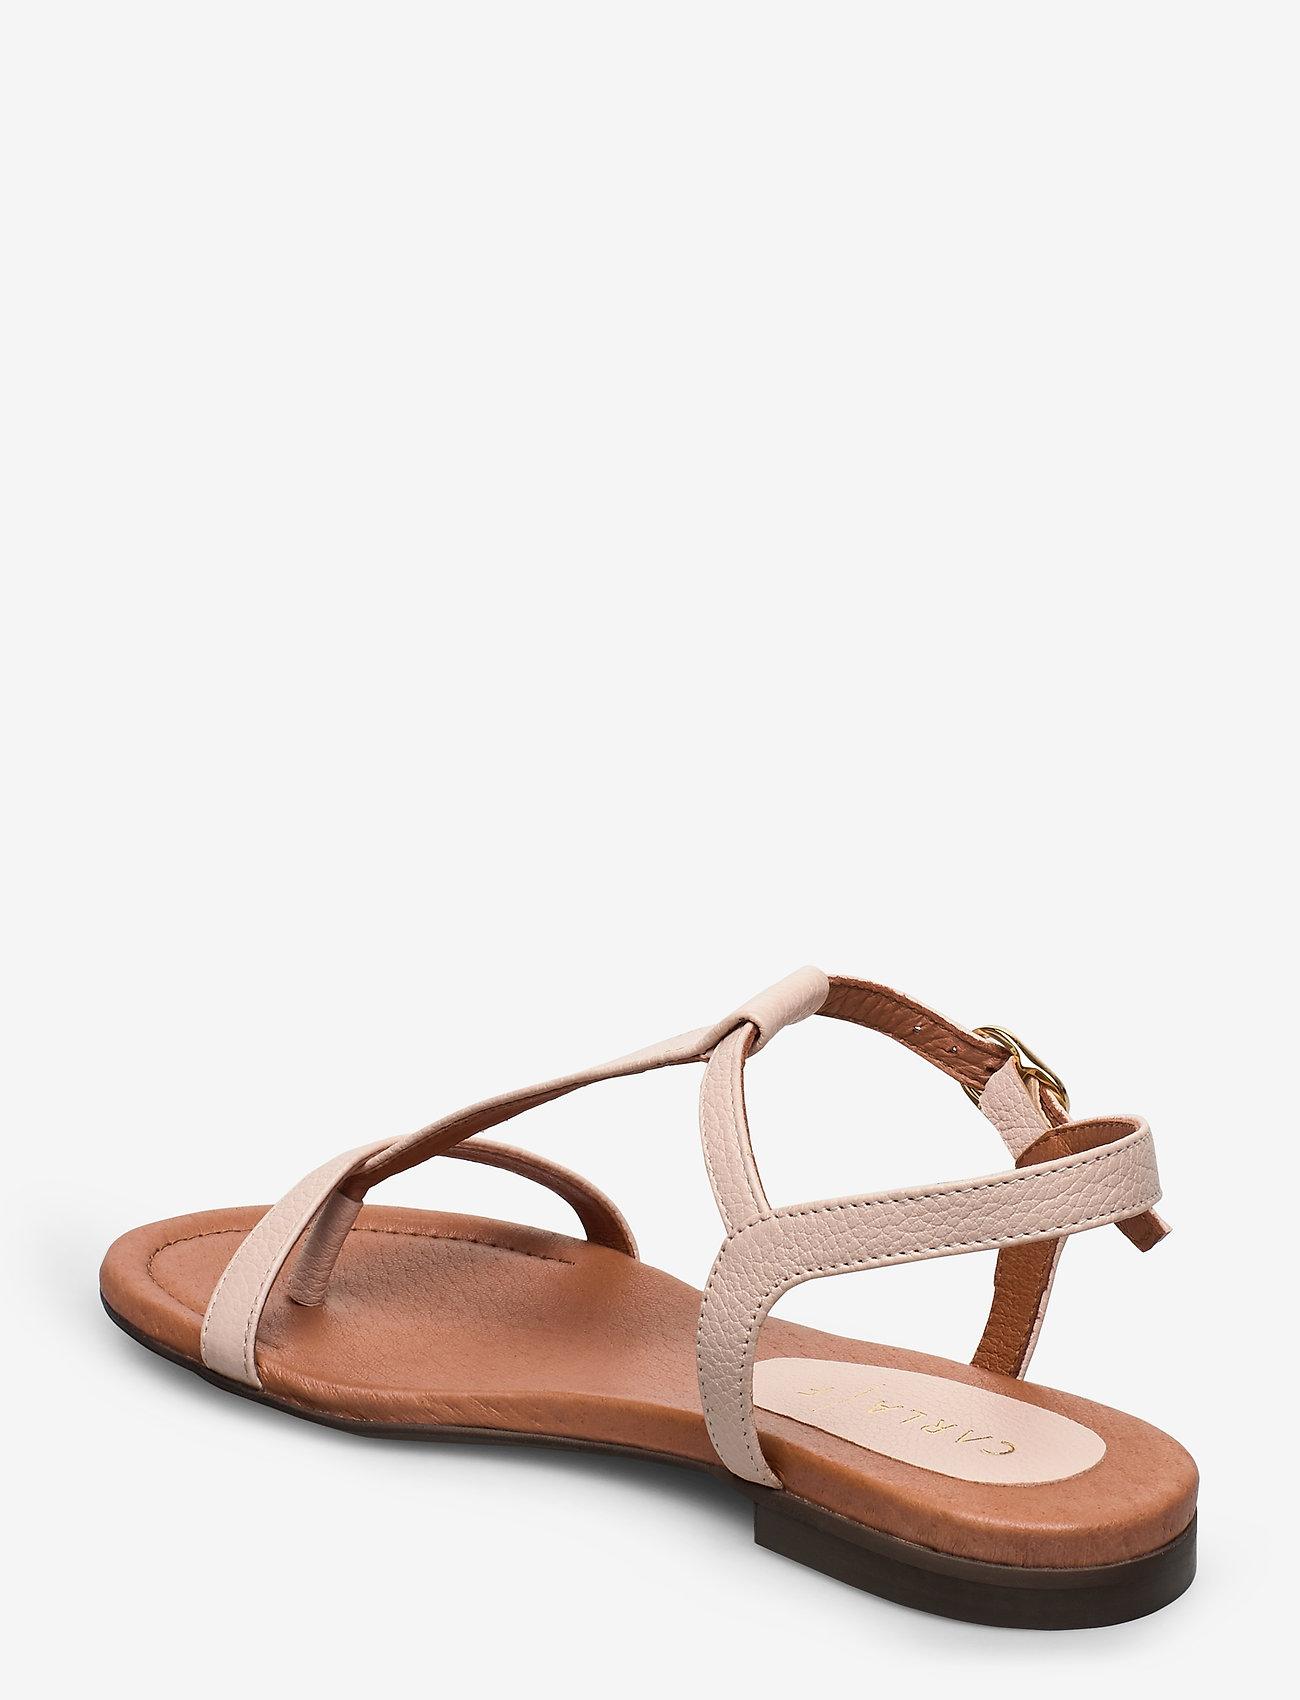 Sandals (Nude Buffalo 89) - Carla F